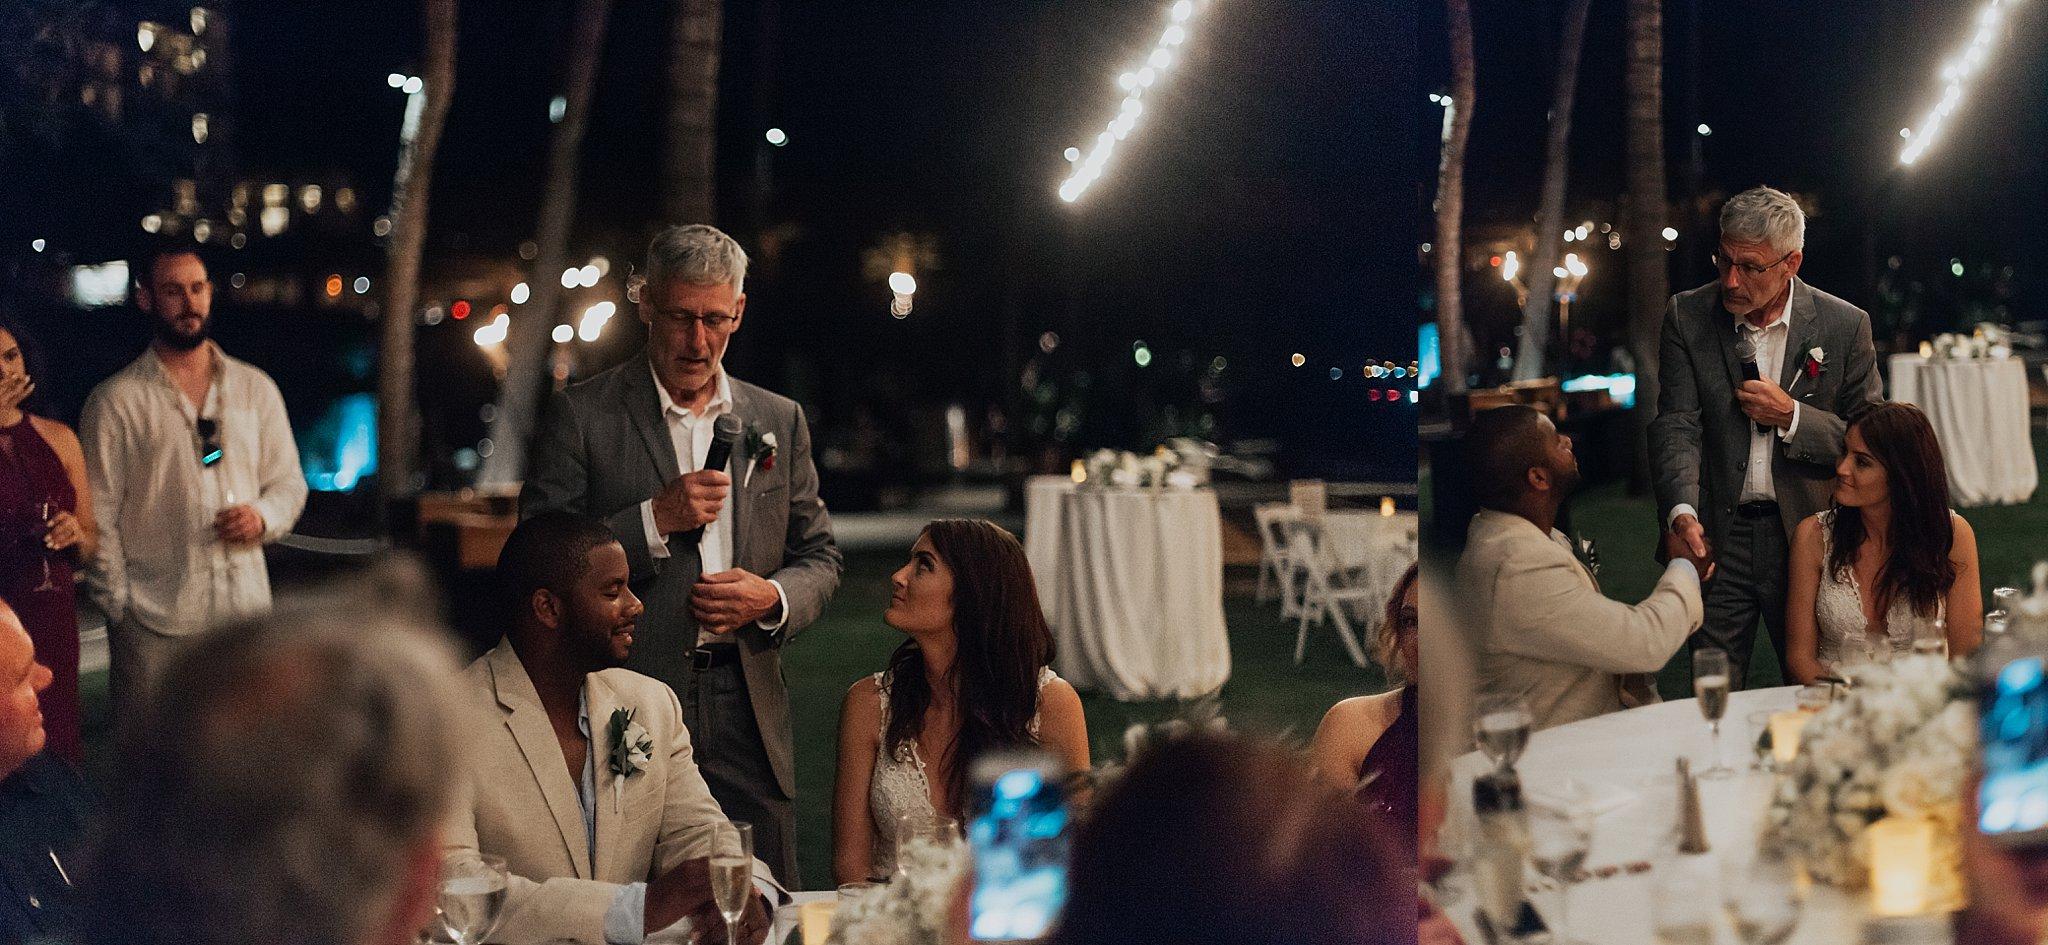 samantha_mcfarlen_bellingham_washington_engagement_photography_seattle_wedding_photographer_0252.jpg